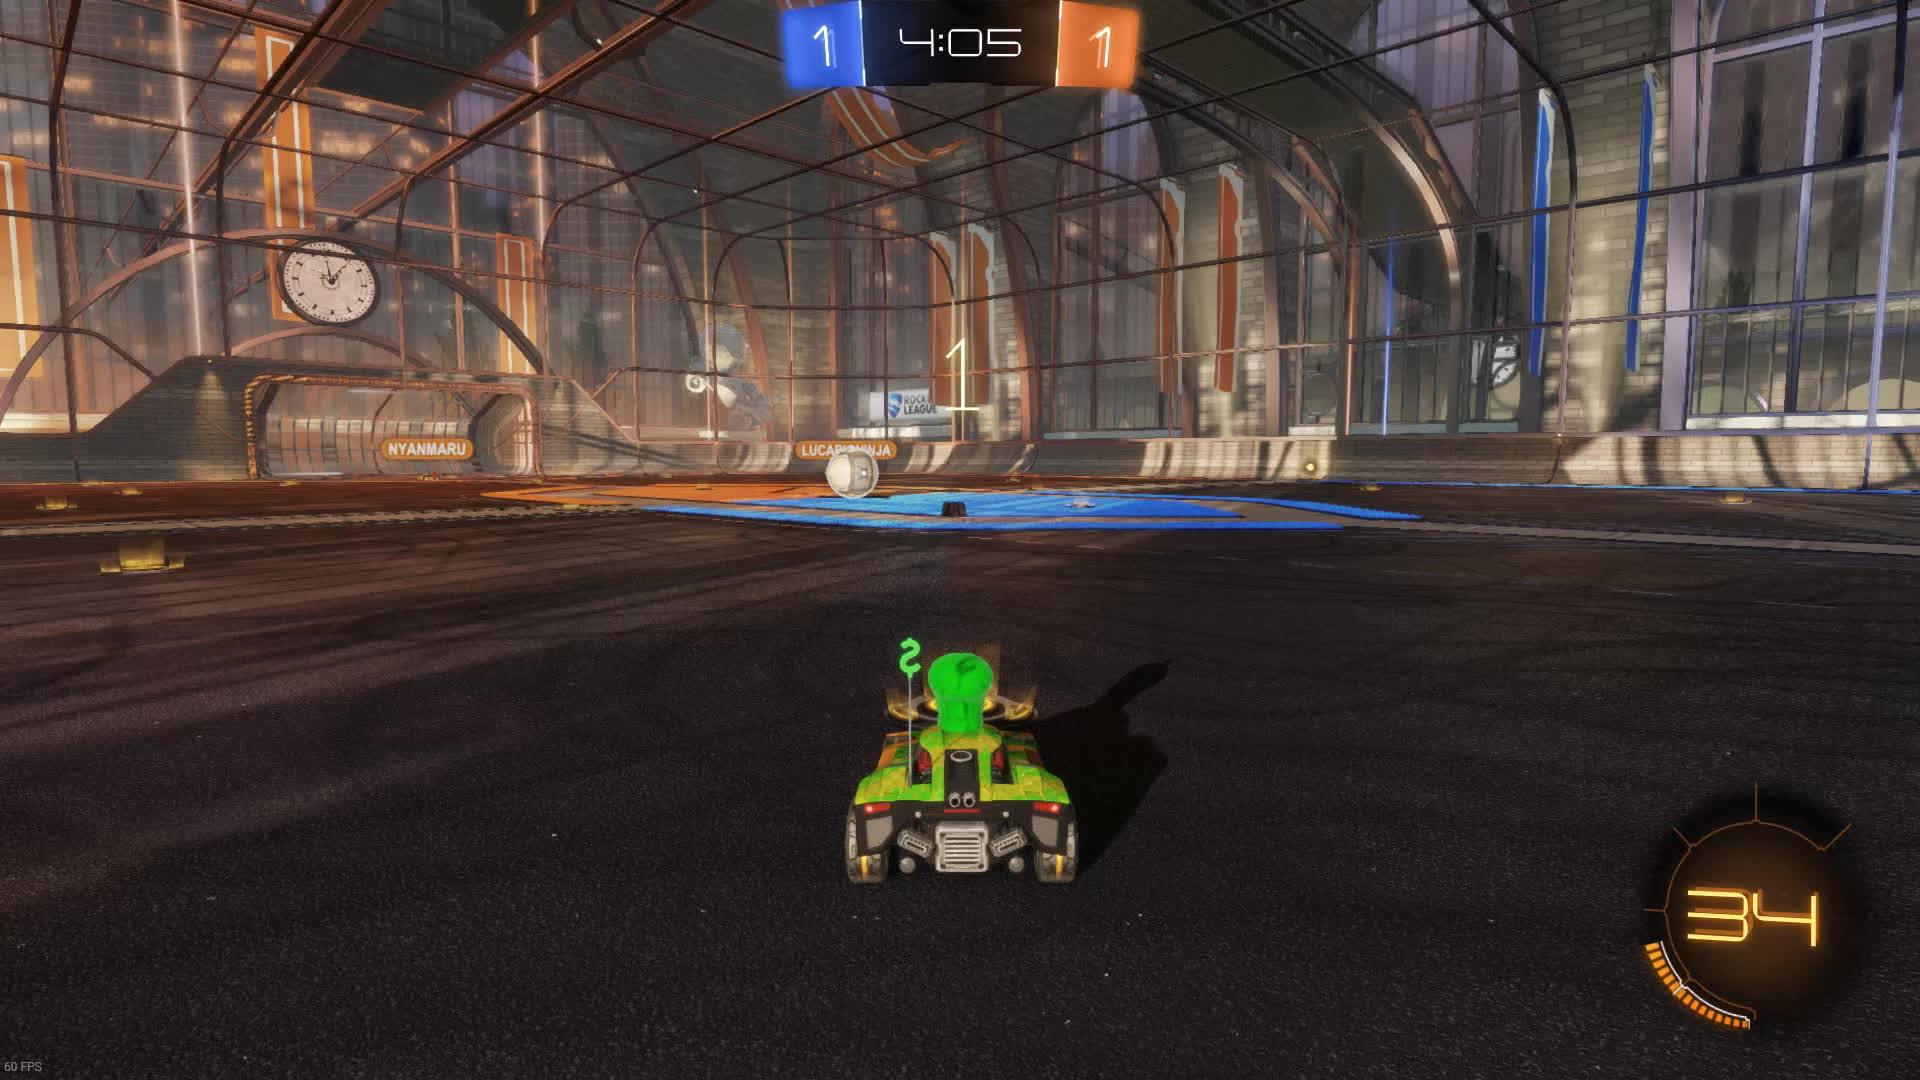 Rocket League, RocketLeagueSchool, rocketleague, rocketleagueschool, A few basics for lower level players [gifs] (reddit) GIFs